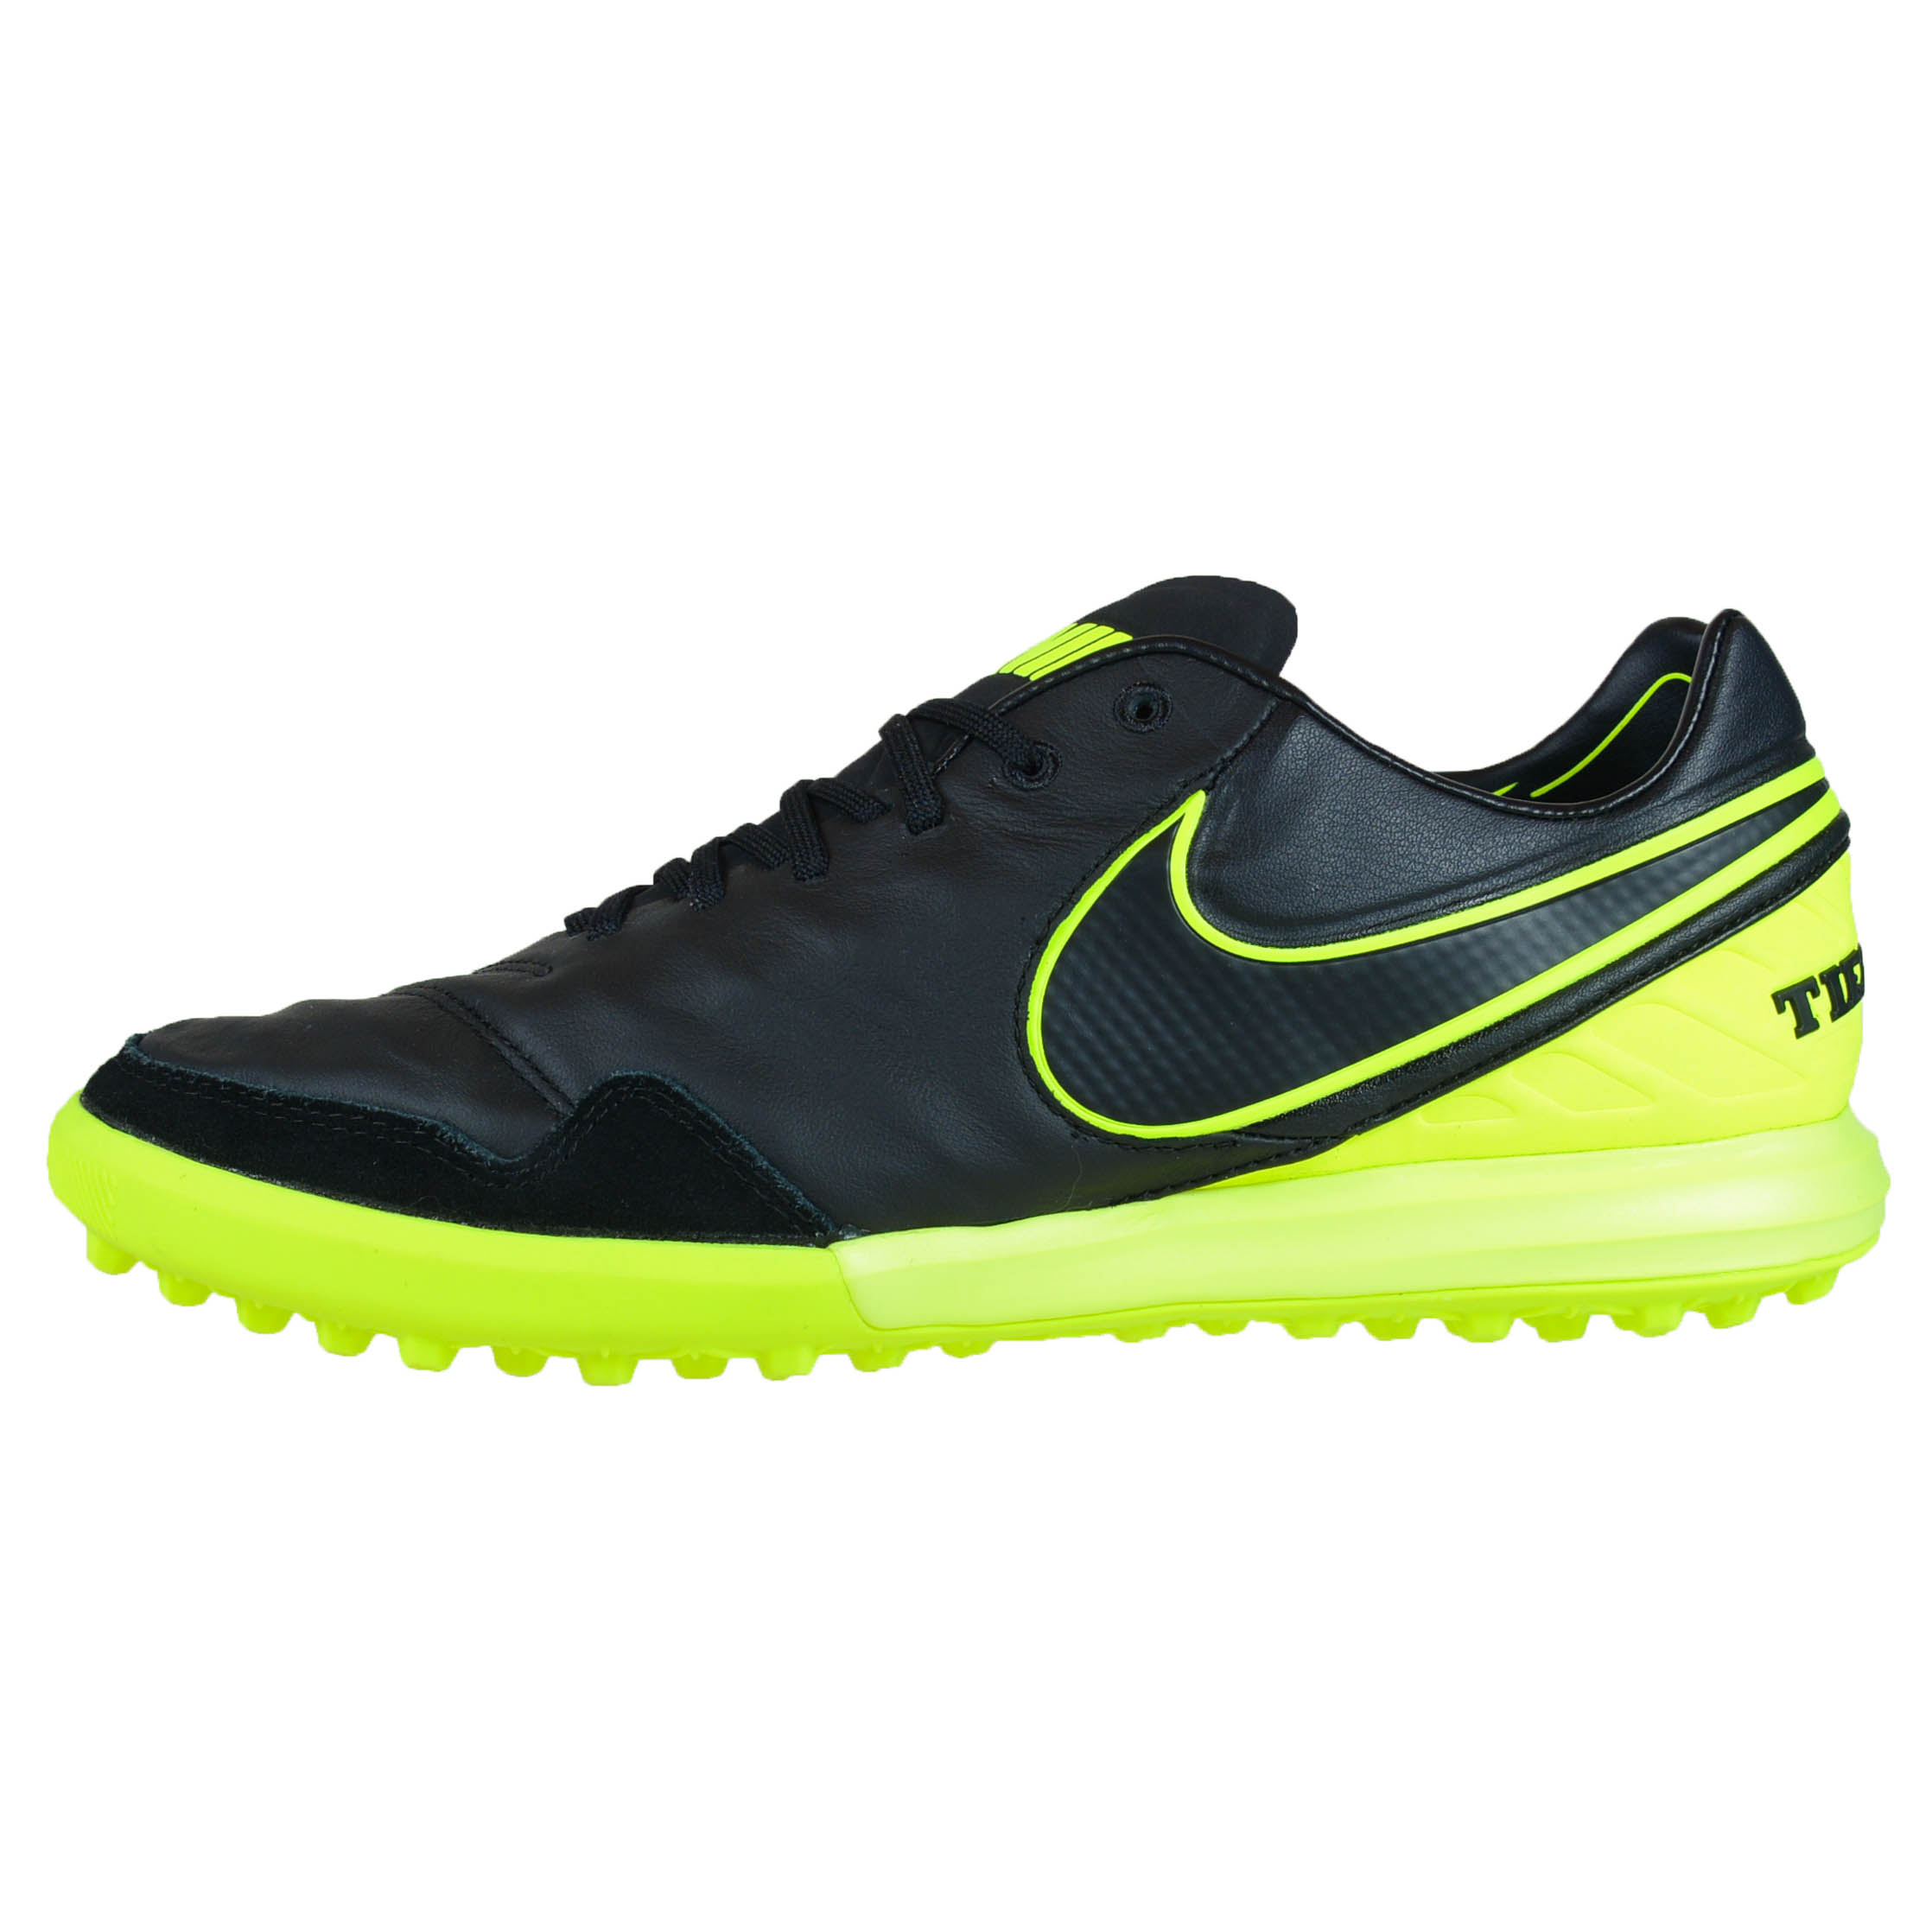 Nike Tiempo Legend Vi Ag R Artificial Turf Soccer Shoe